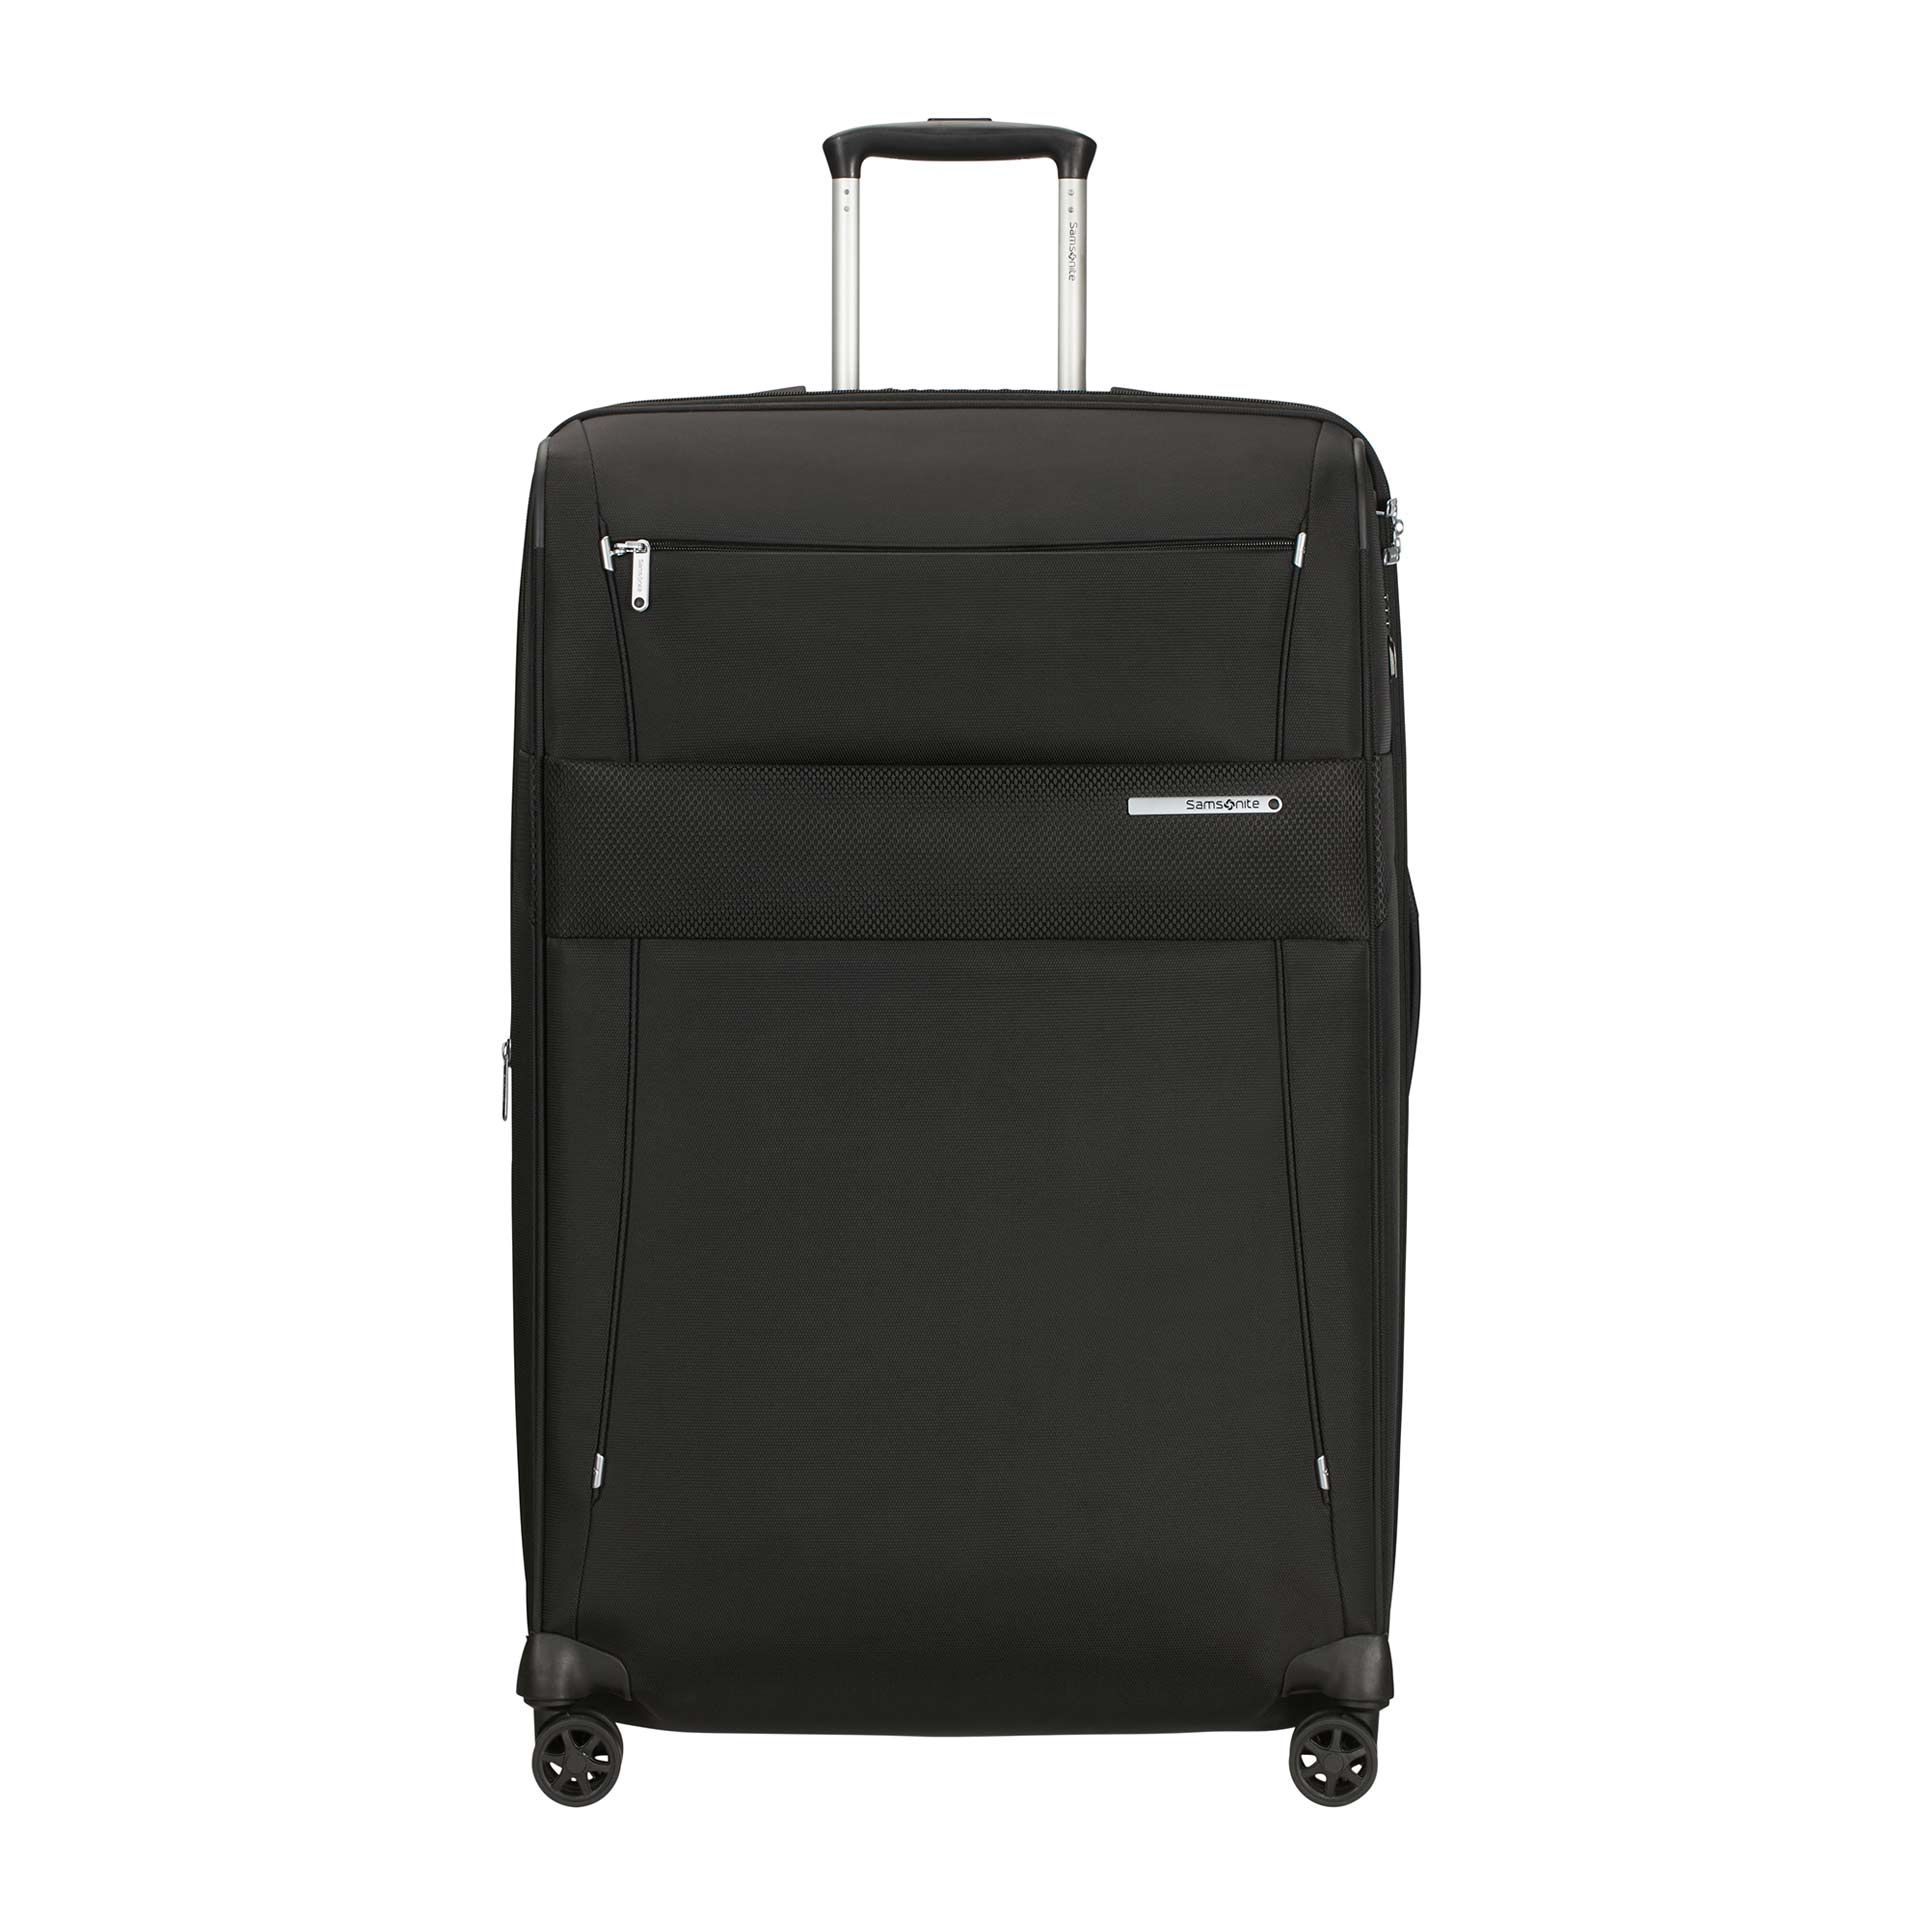 Duopack Trolley mit 4 Rollen 78 cm black